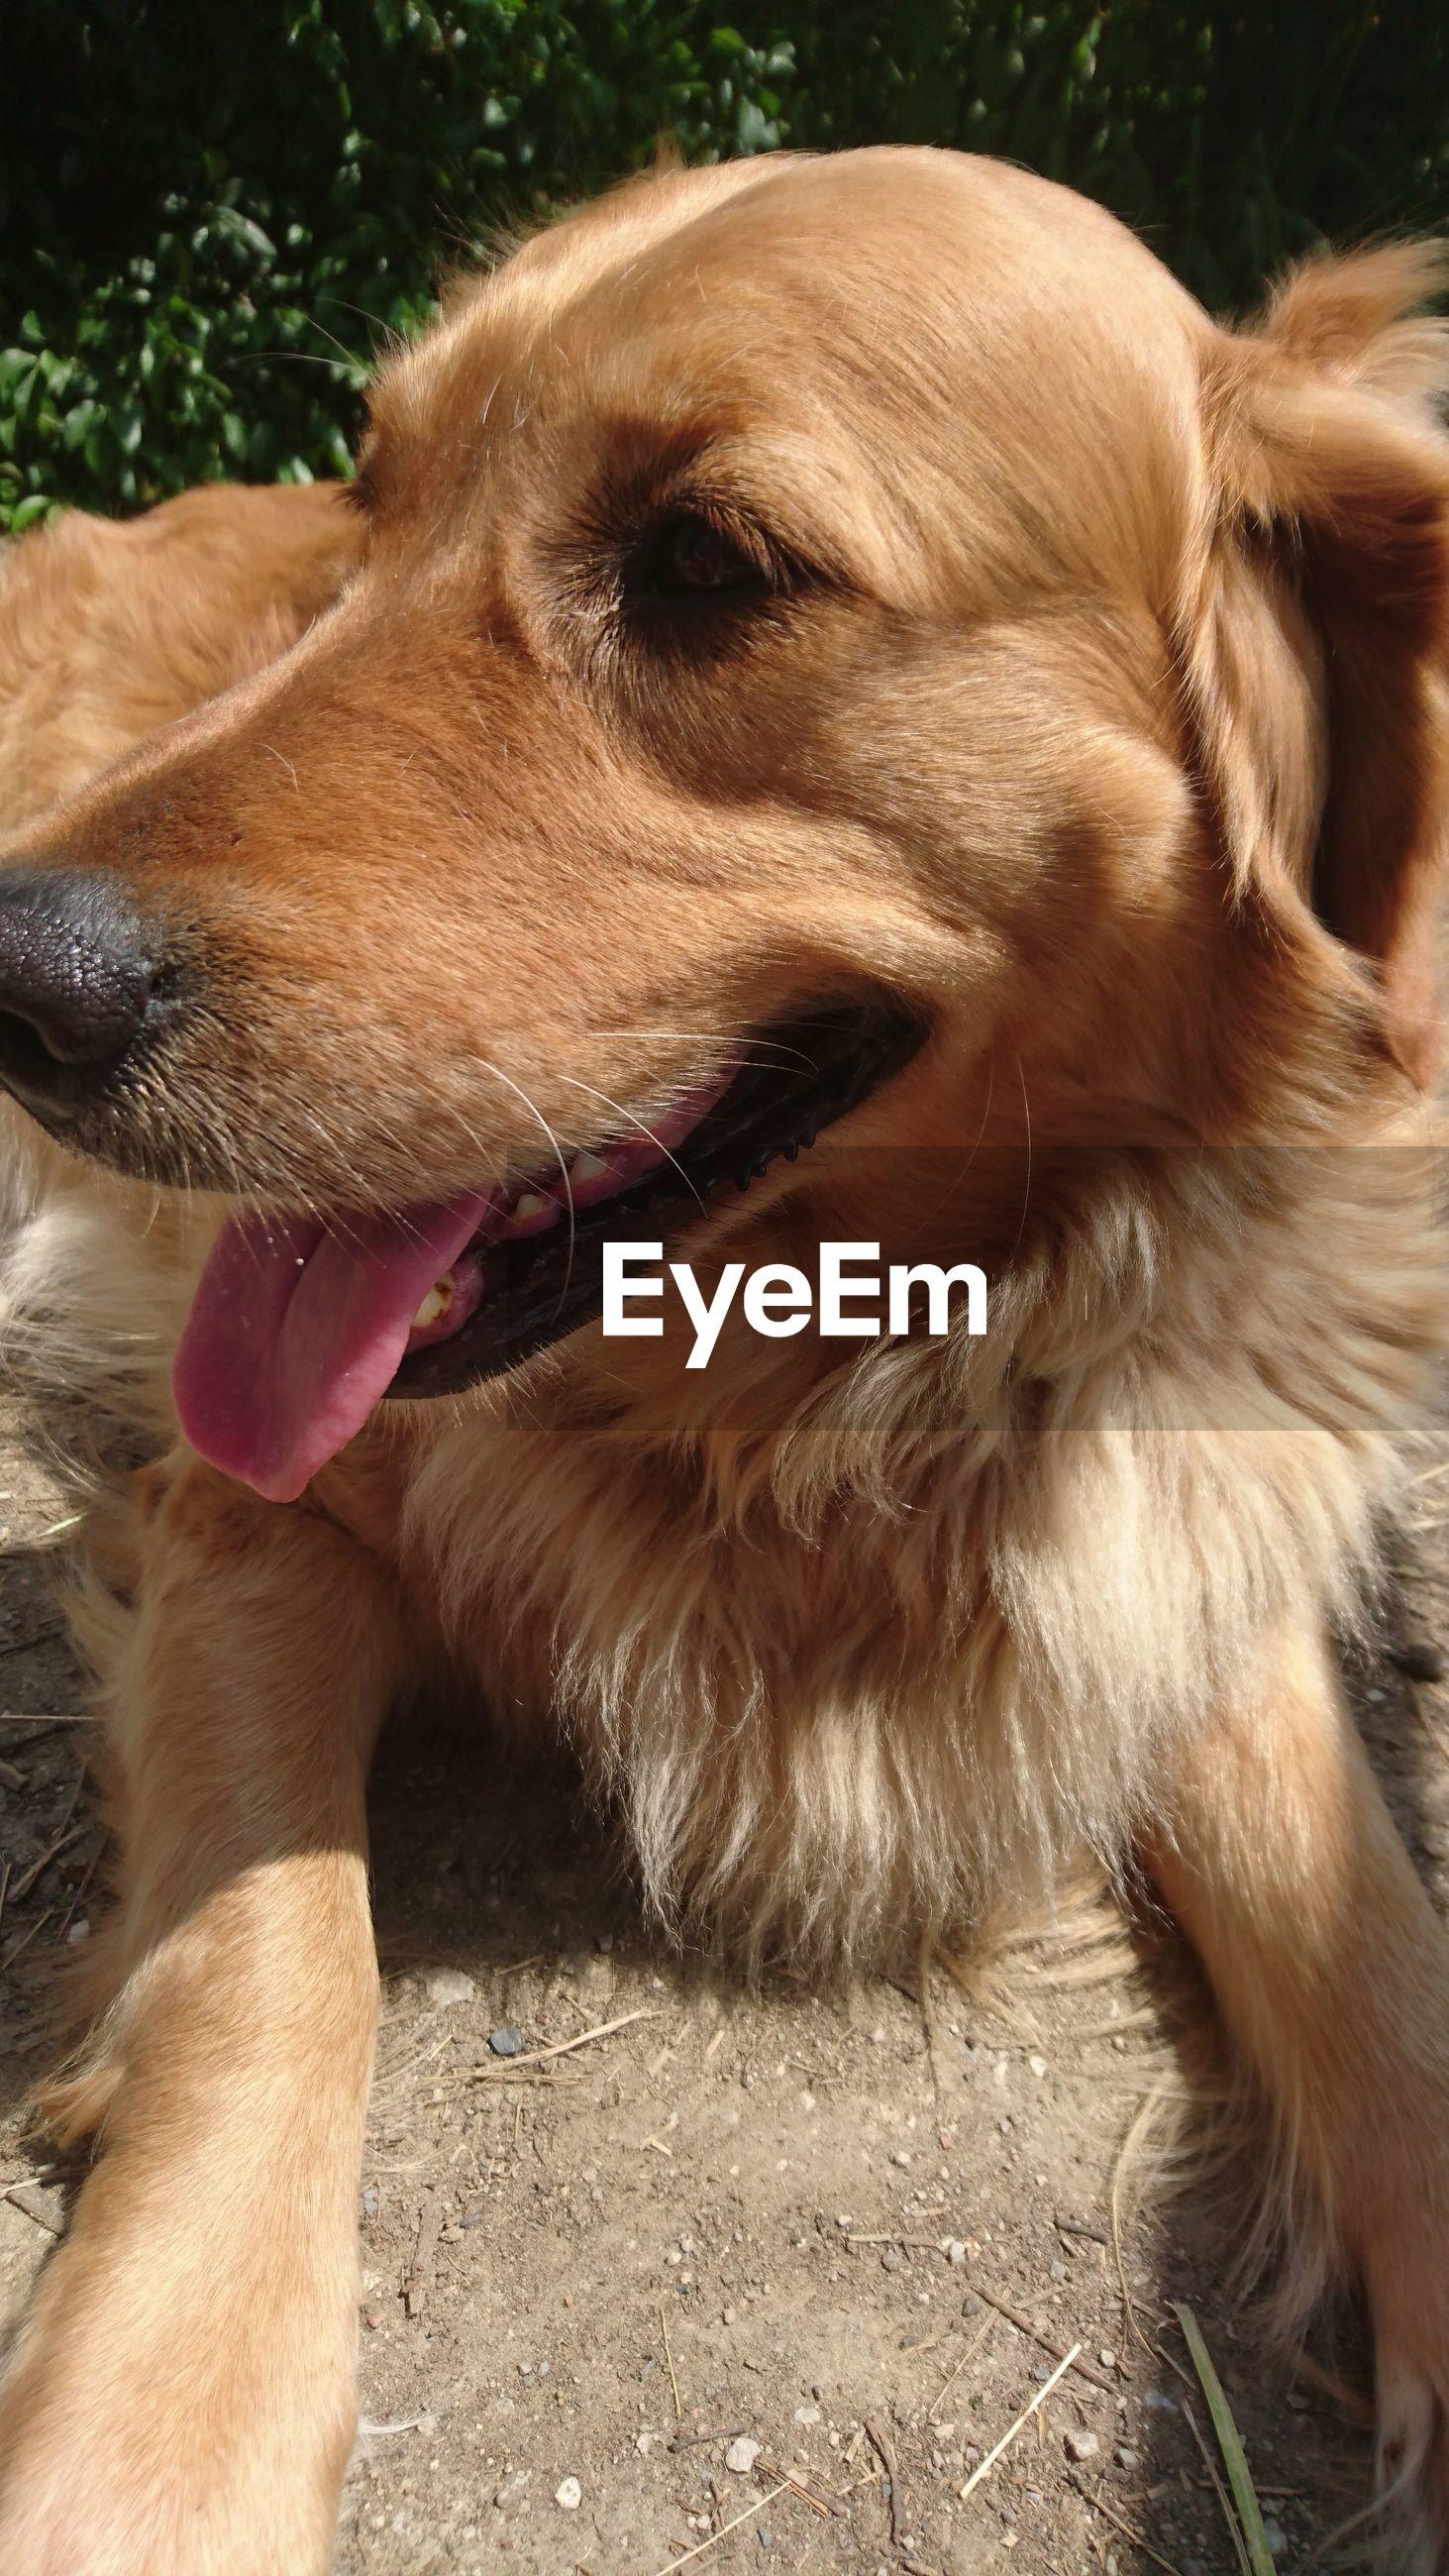 CLOSE-UP OF BROWN DOG